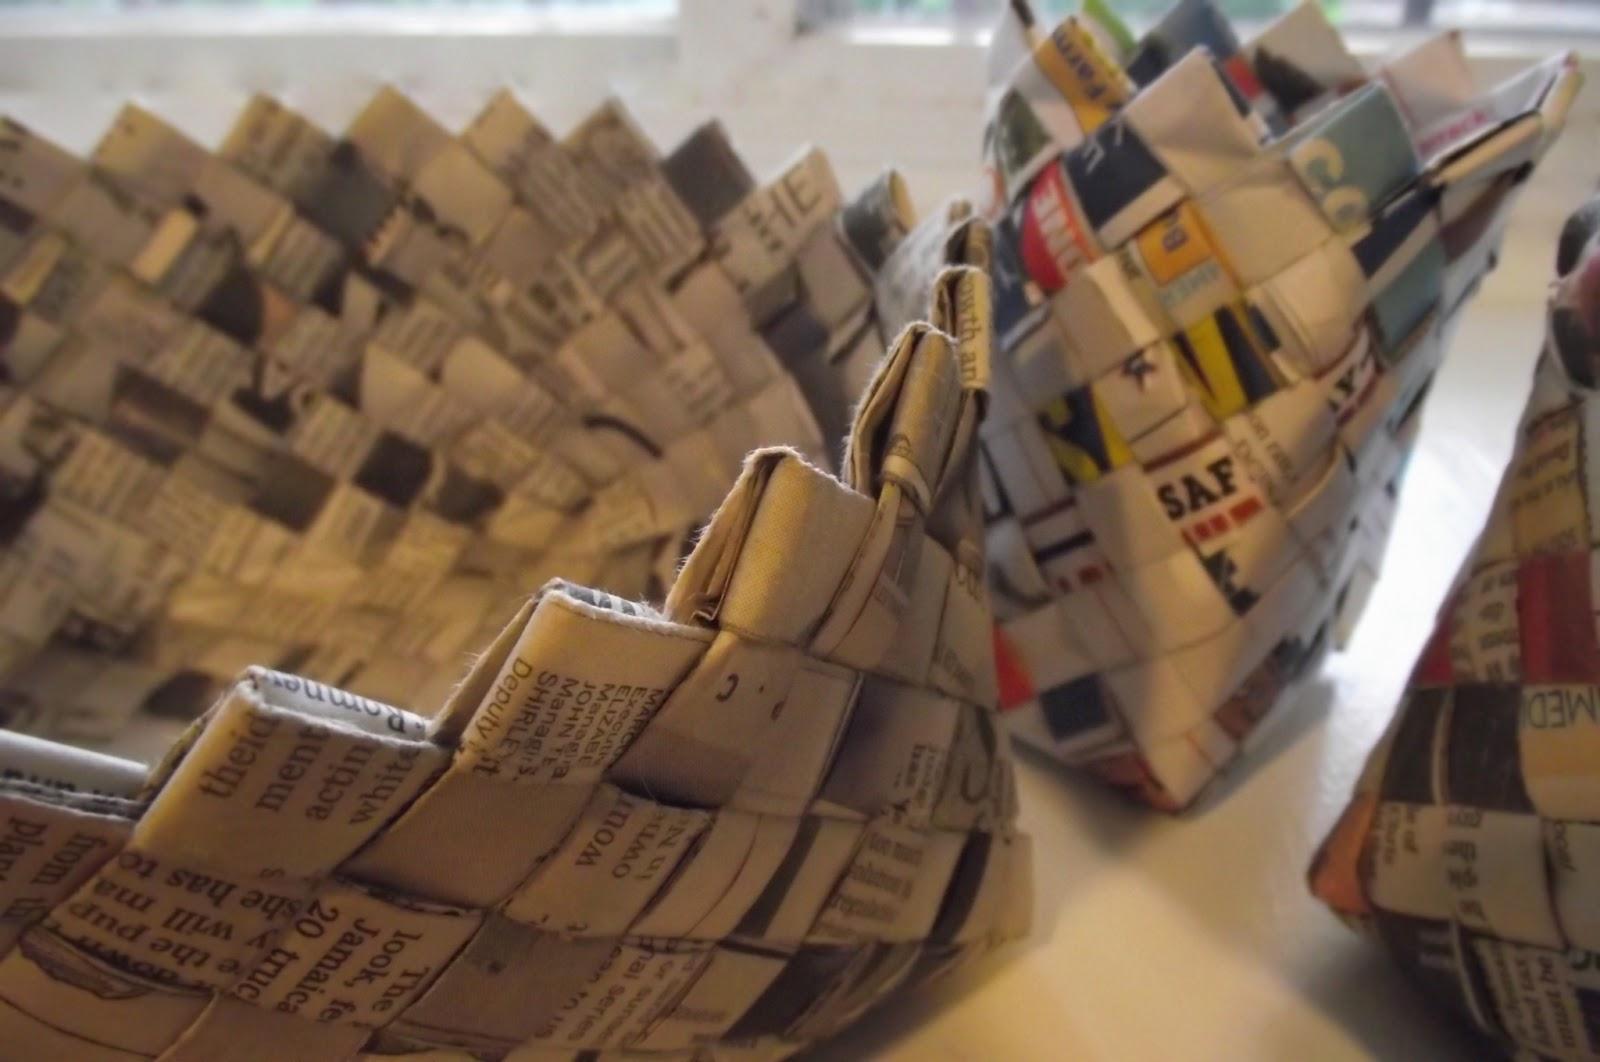 Basket Making Using Newspaper : Make it and use making woven newspaper baskets